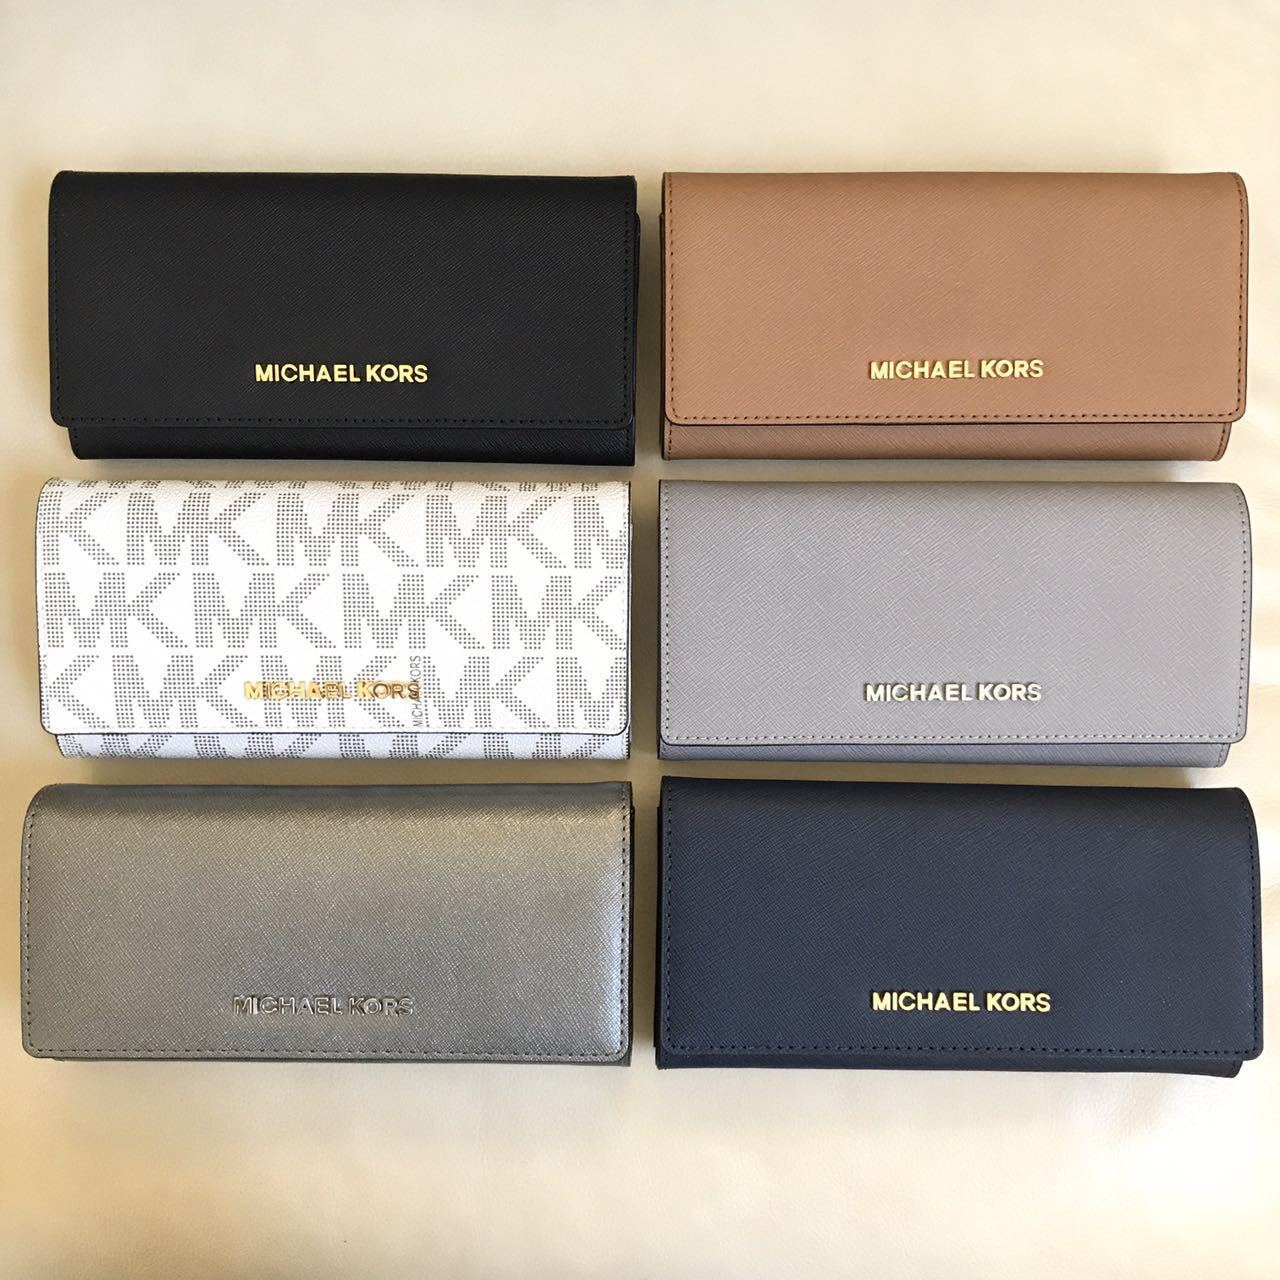 Michael Kors - NEW Michael Kors Jet Set Saffiano Leather PVC Carryall Wallet Various Colors